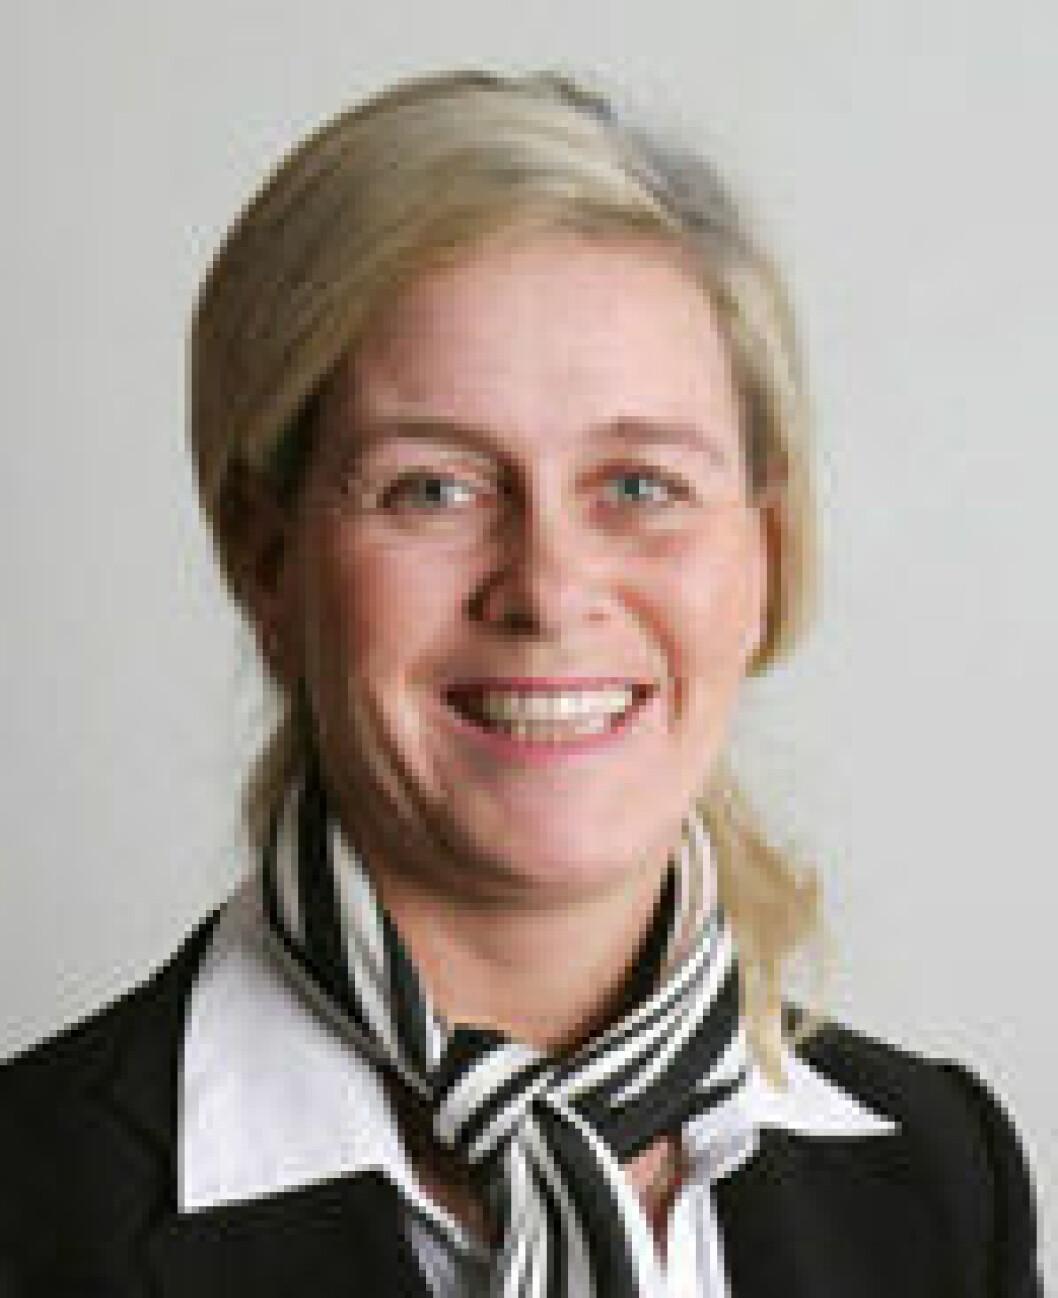 Heidi Lill M Oppegaard